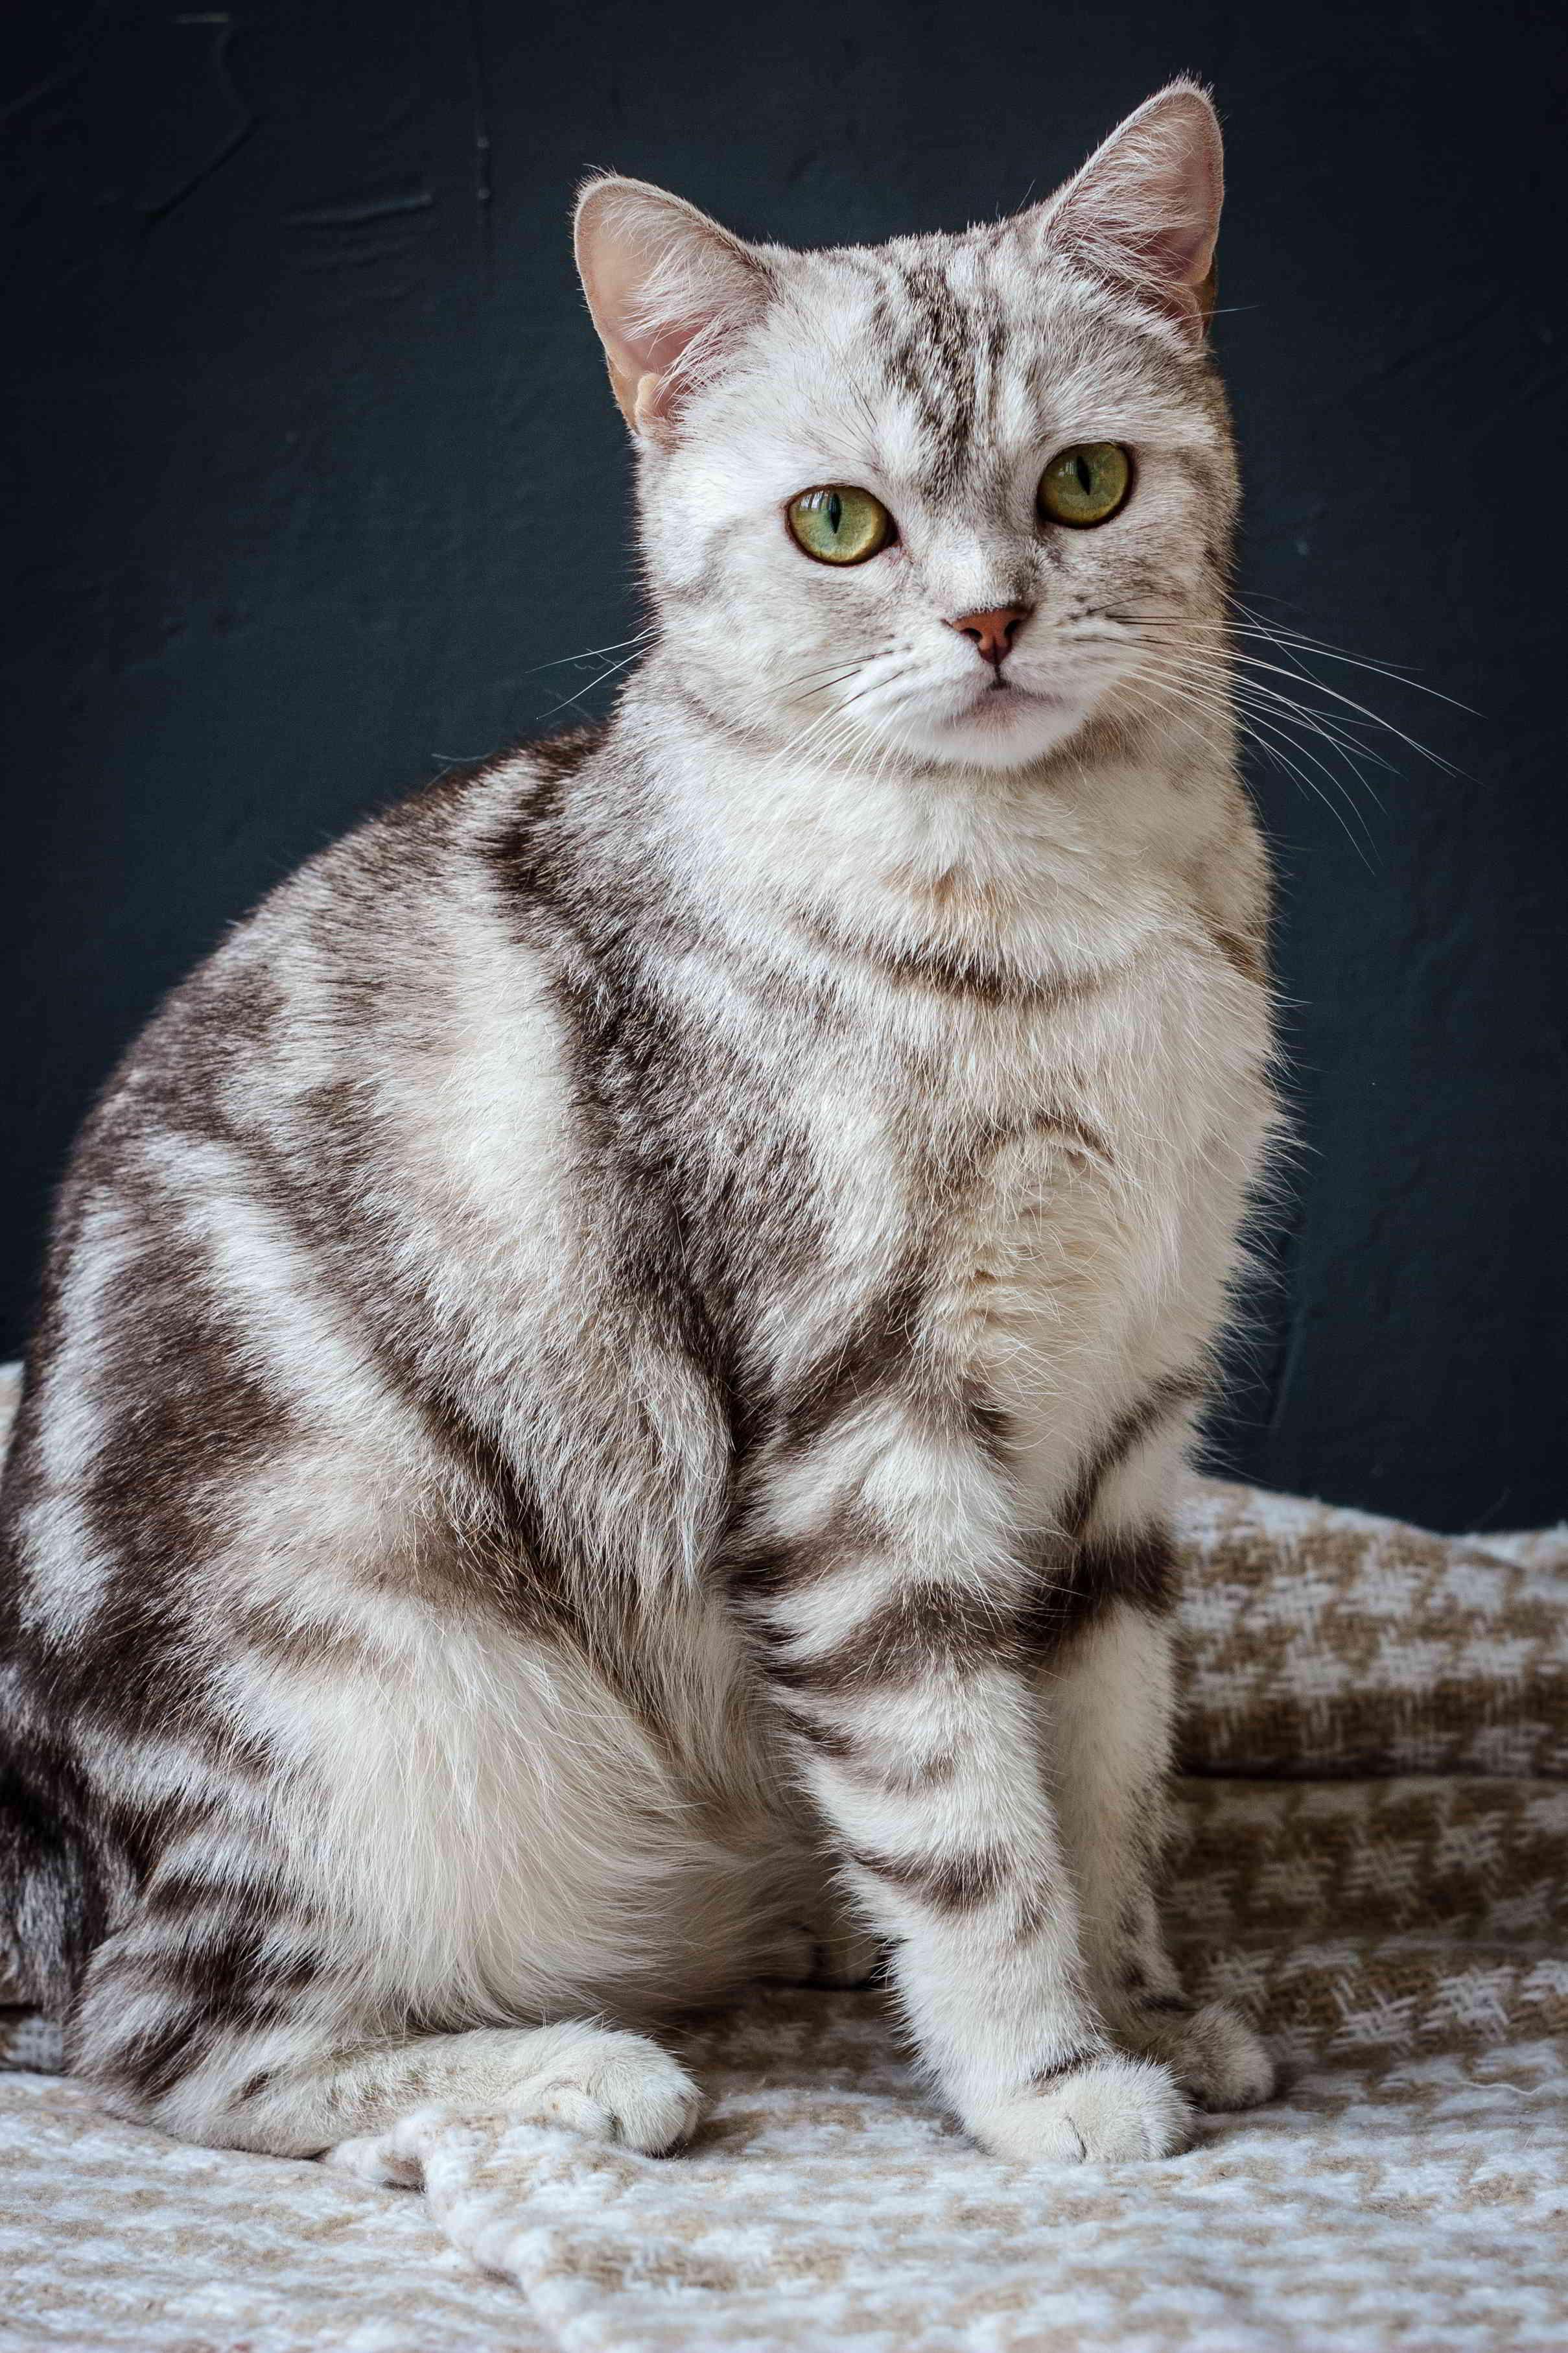 Download Adorable Cat Pictures Photos Images ga2t0m0Ib